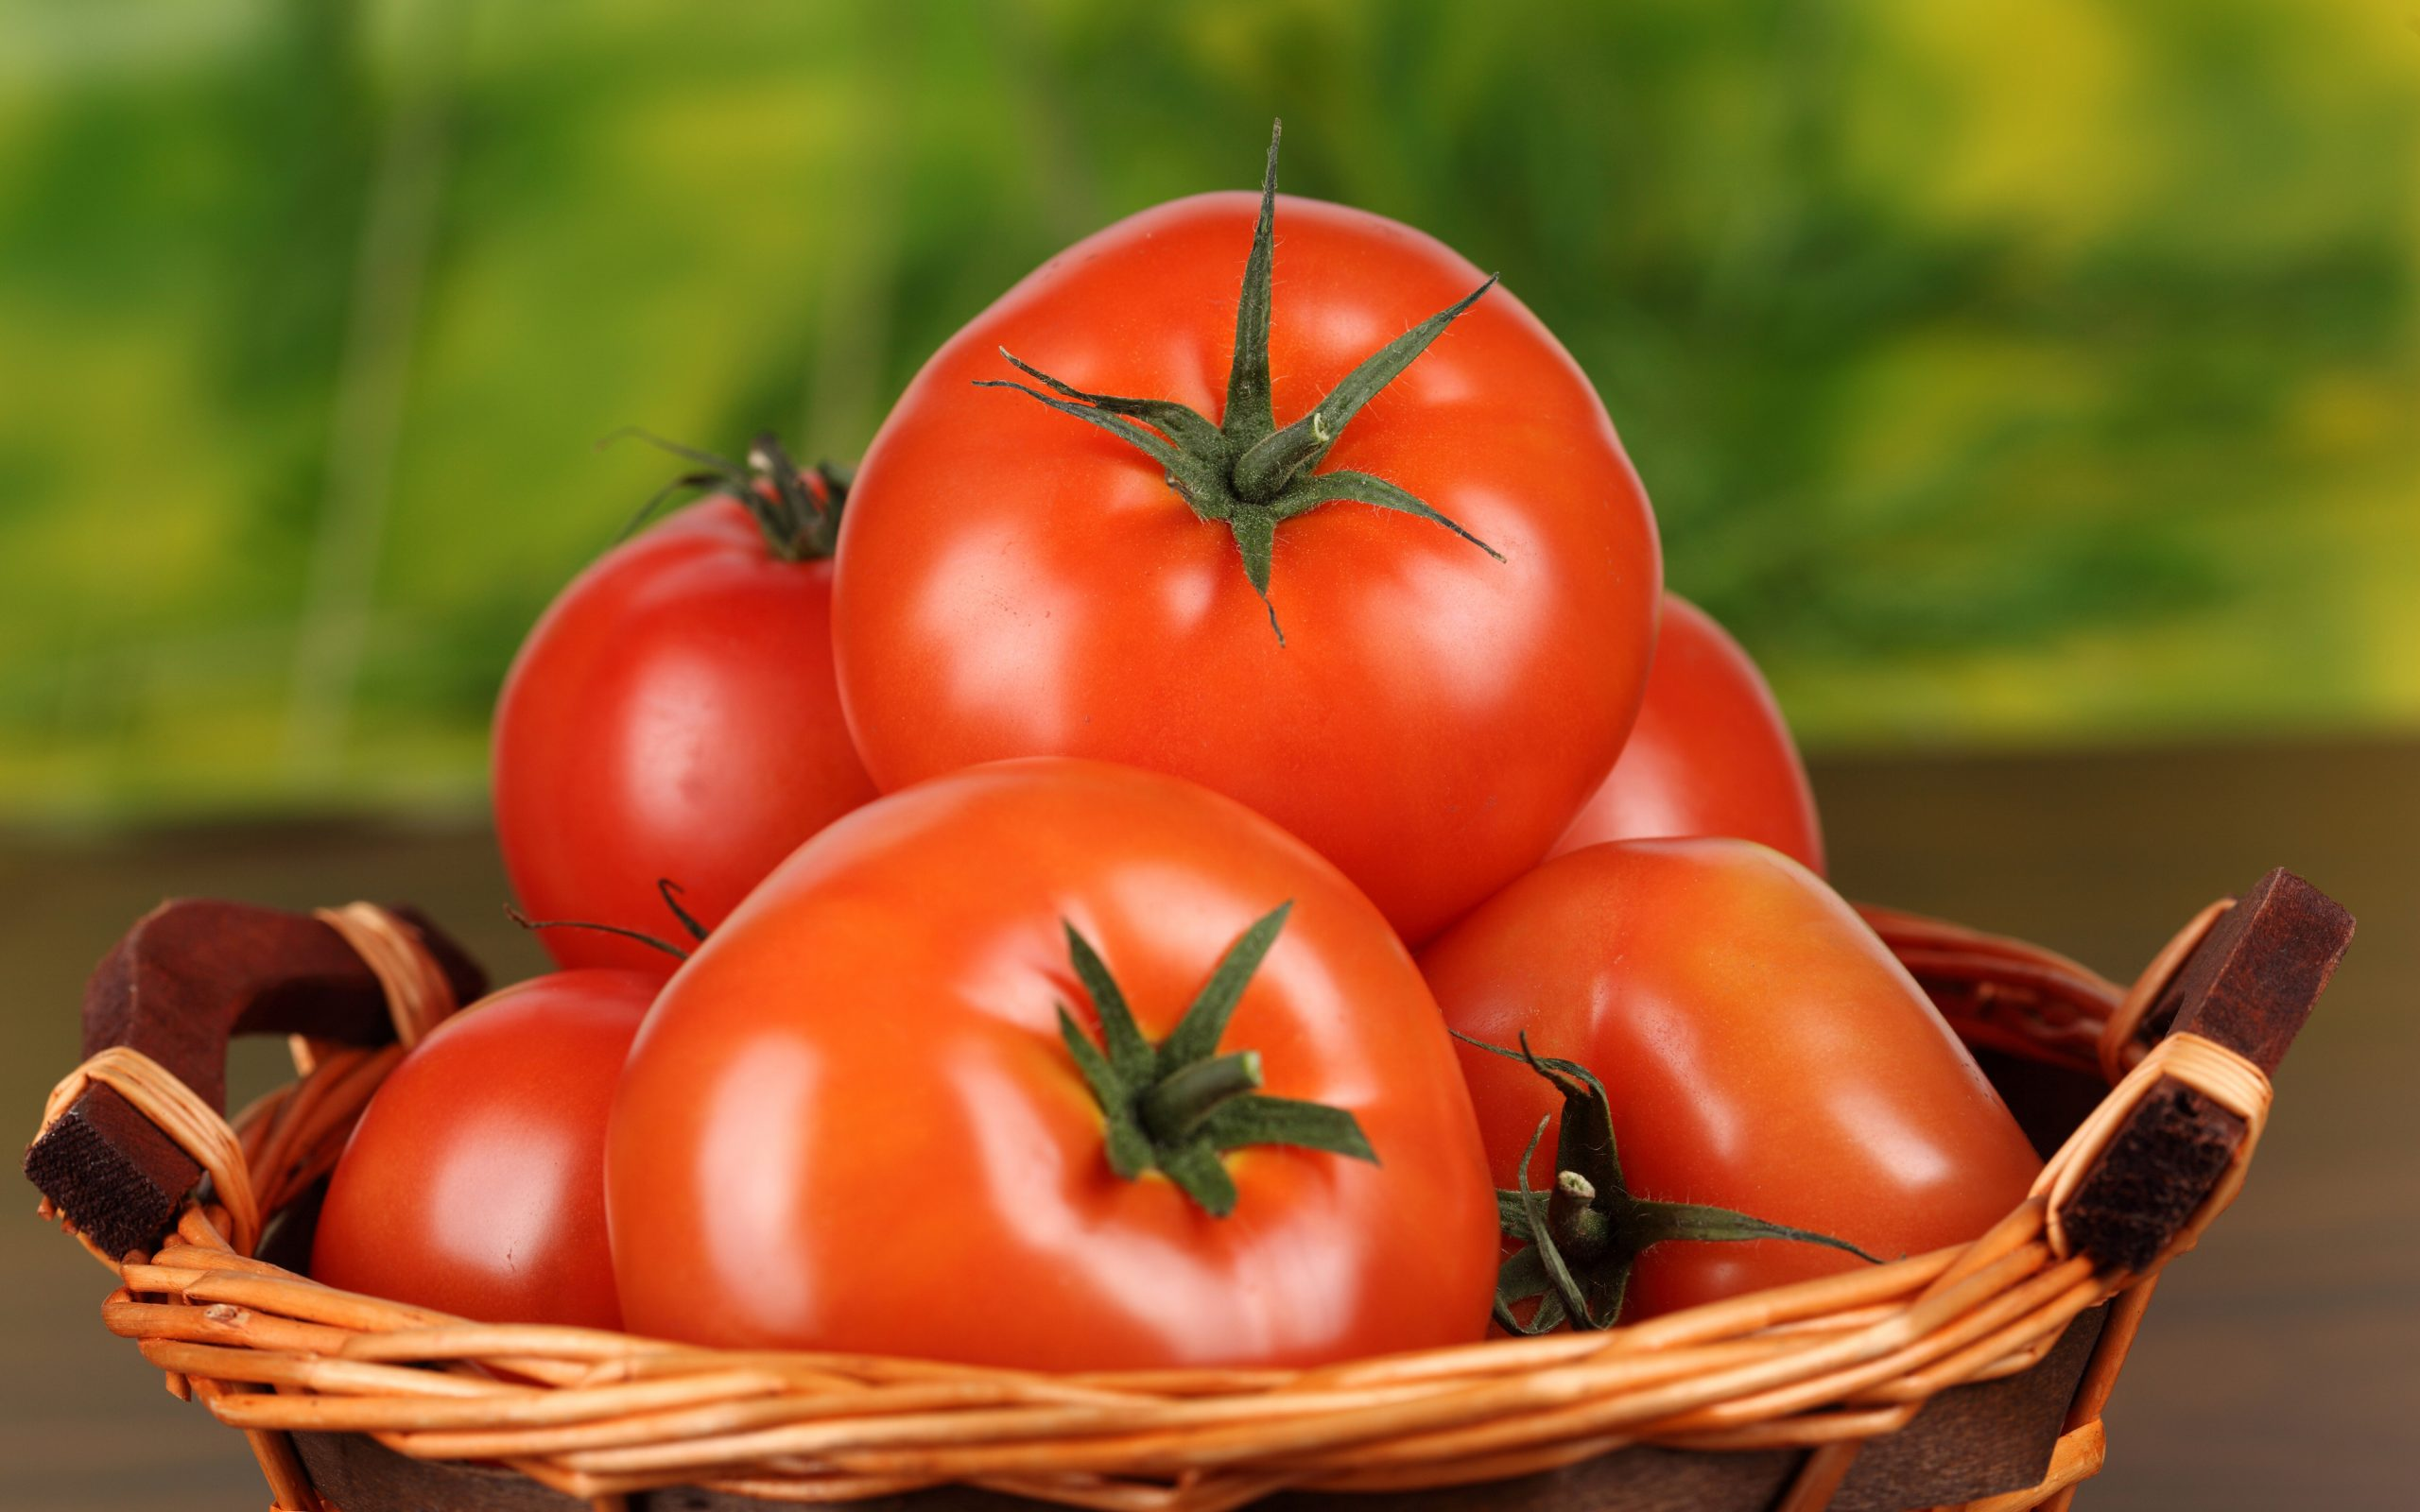 tomate para remover manchas do rosto